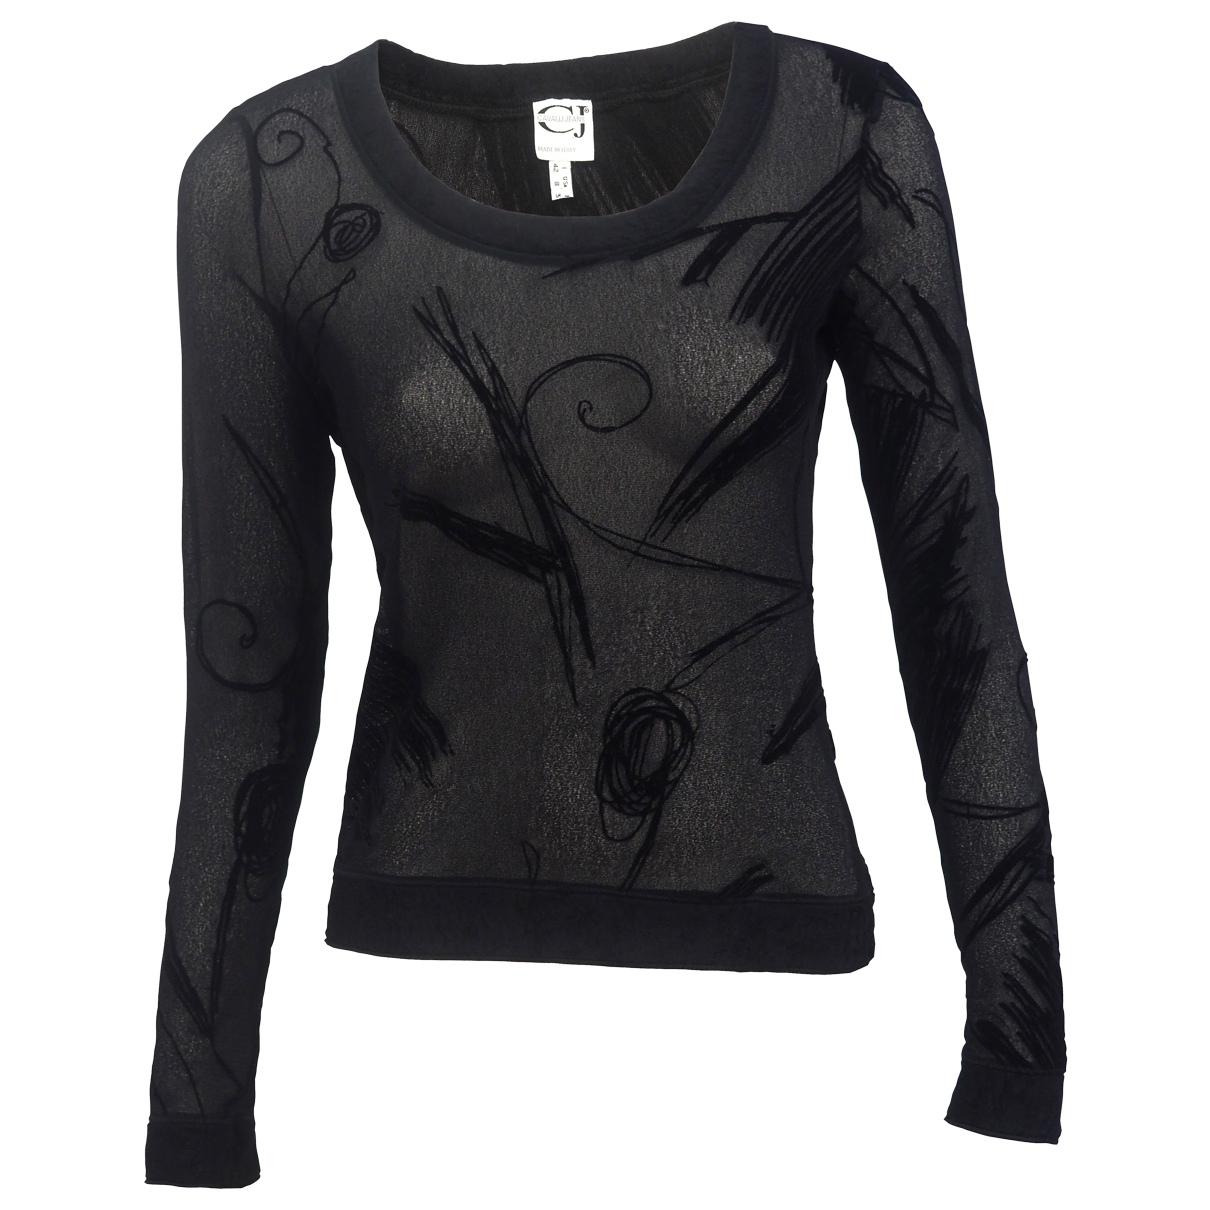 Roberto Cavalli \N Black  top for Women 42 IT